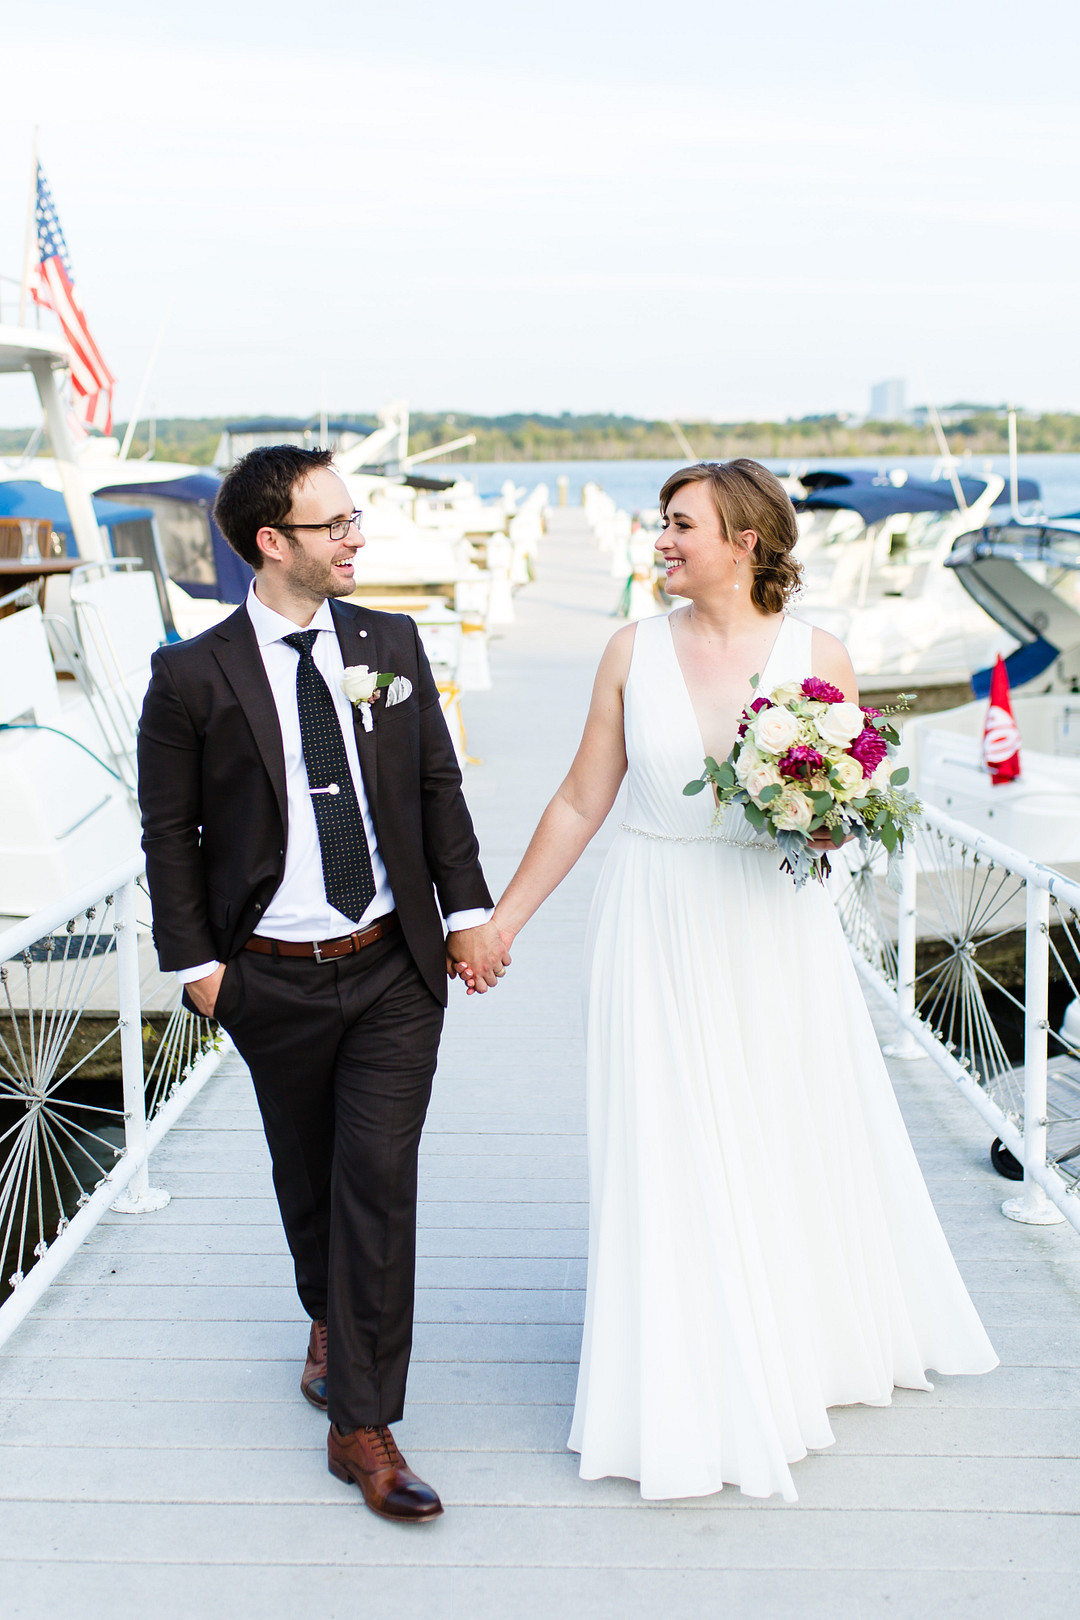 Deupree_Iorio_Megan Rei Photography_carlyle-house-wedding-megan-rei-photography-66_low